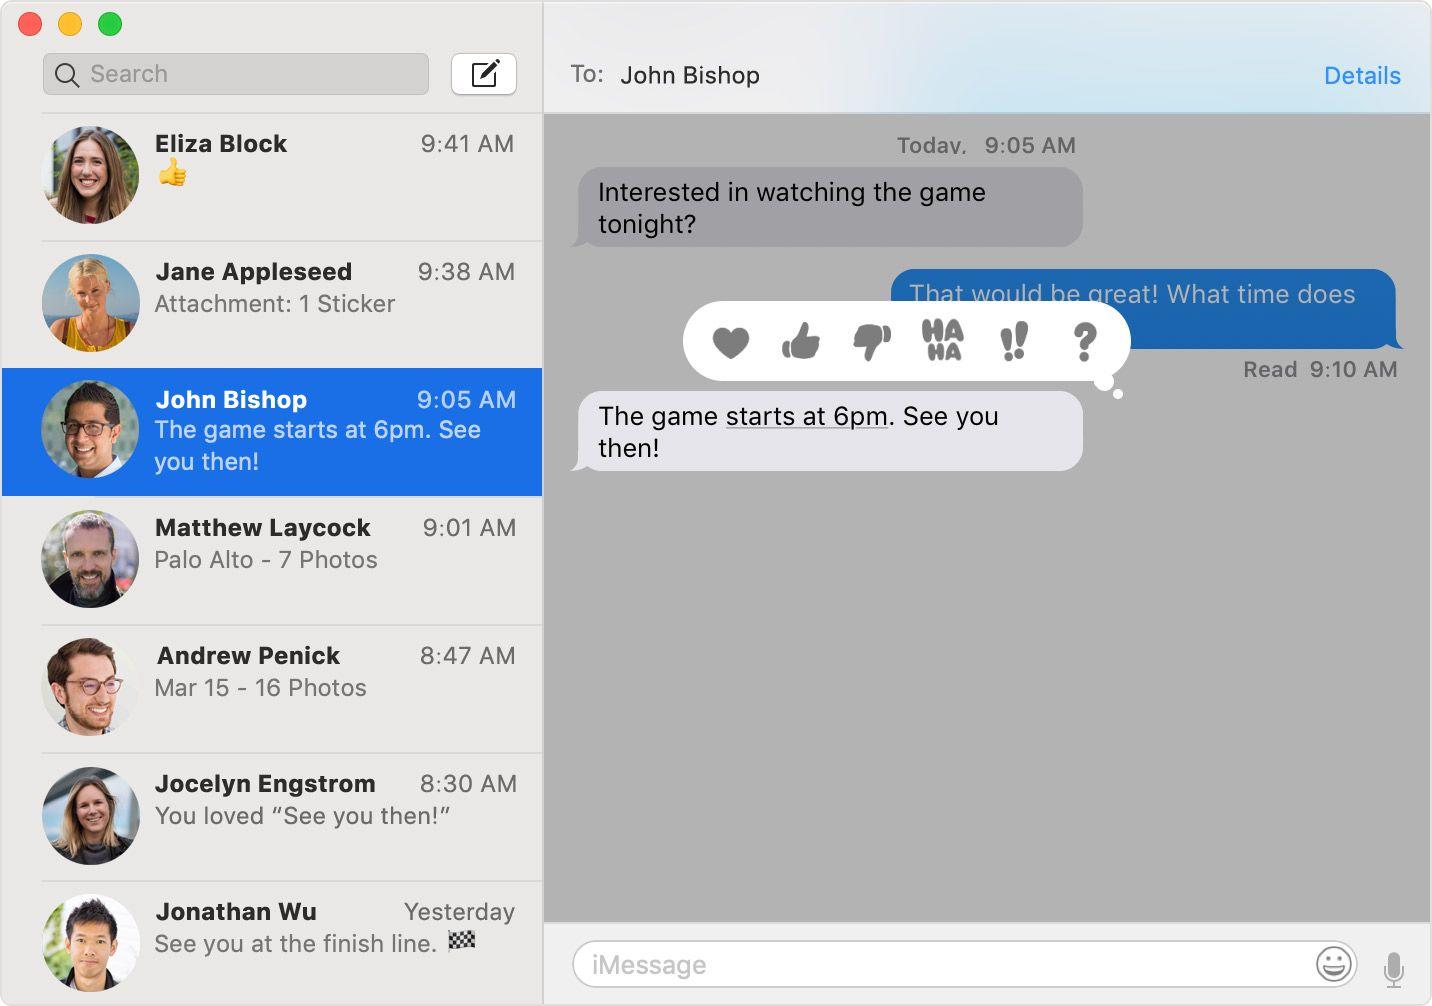 e7f92f18d5248d0f2eaf5ff03c0c1e6f - How To Get The Messages App On Your Mac